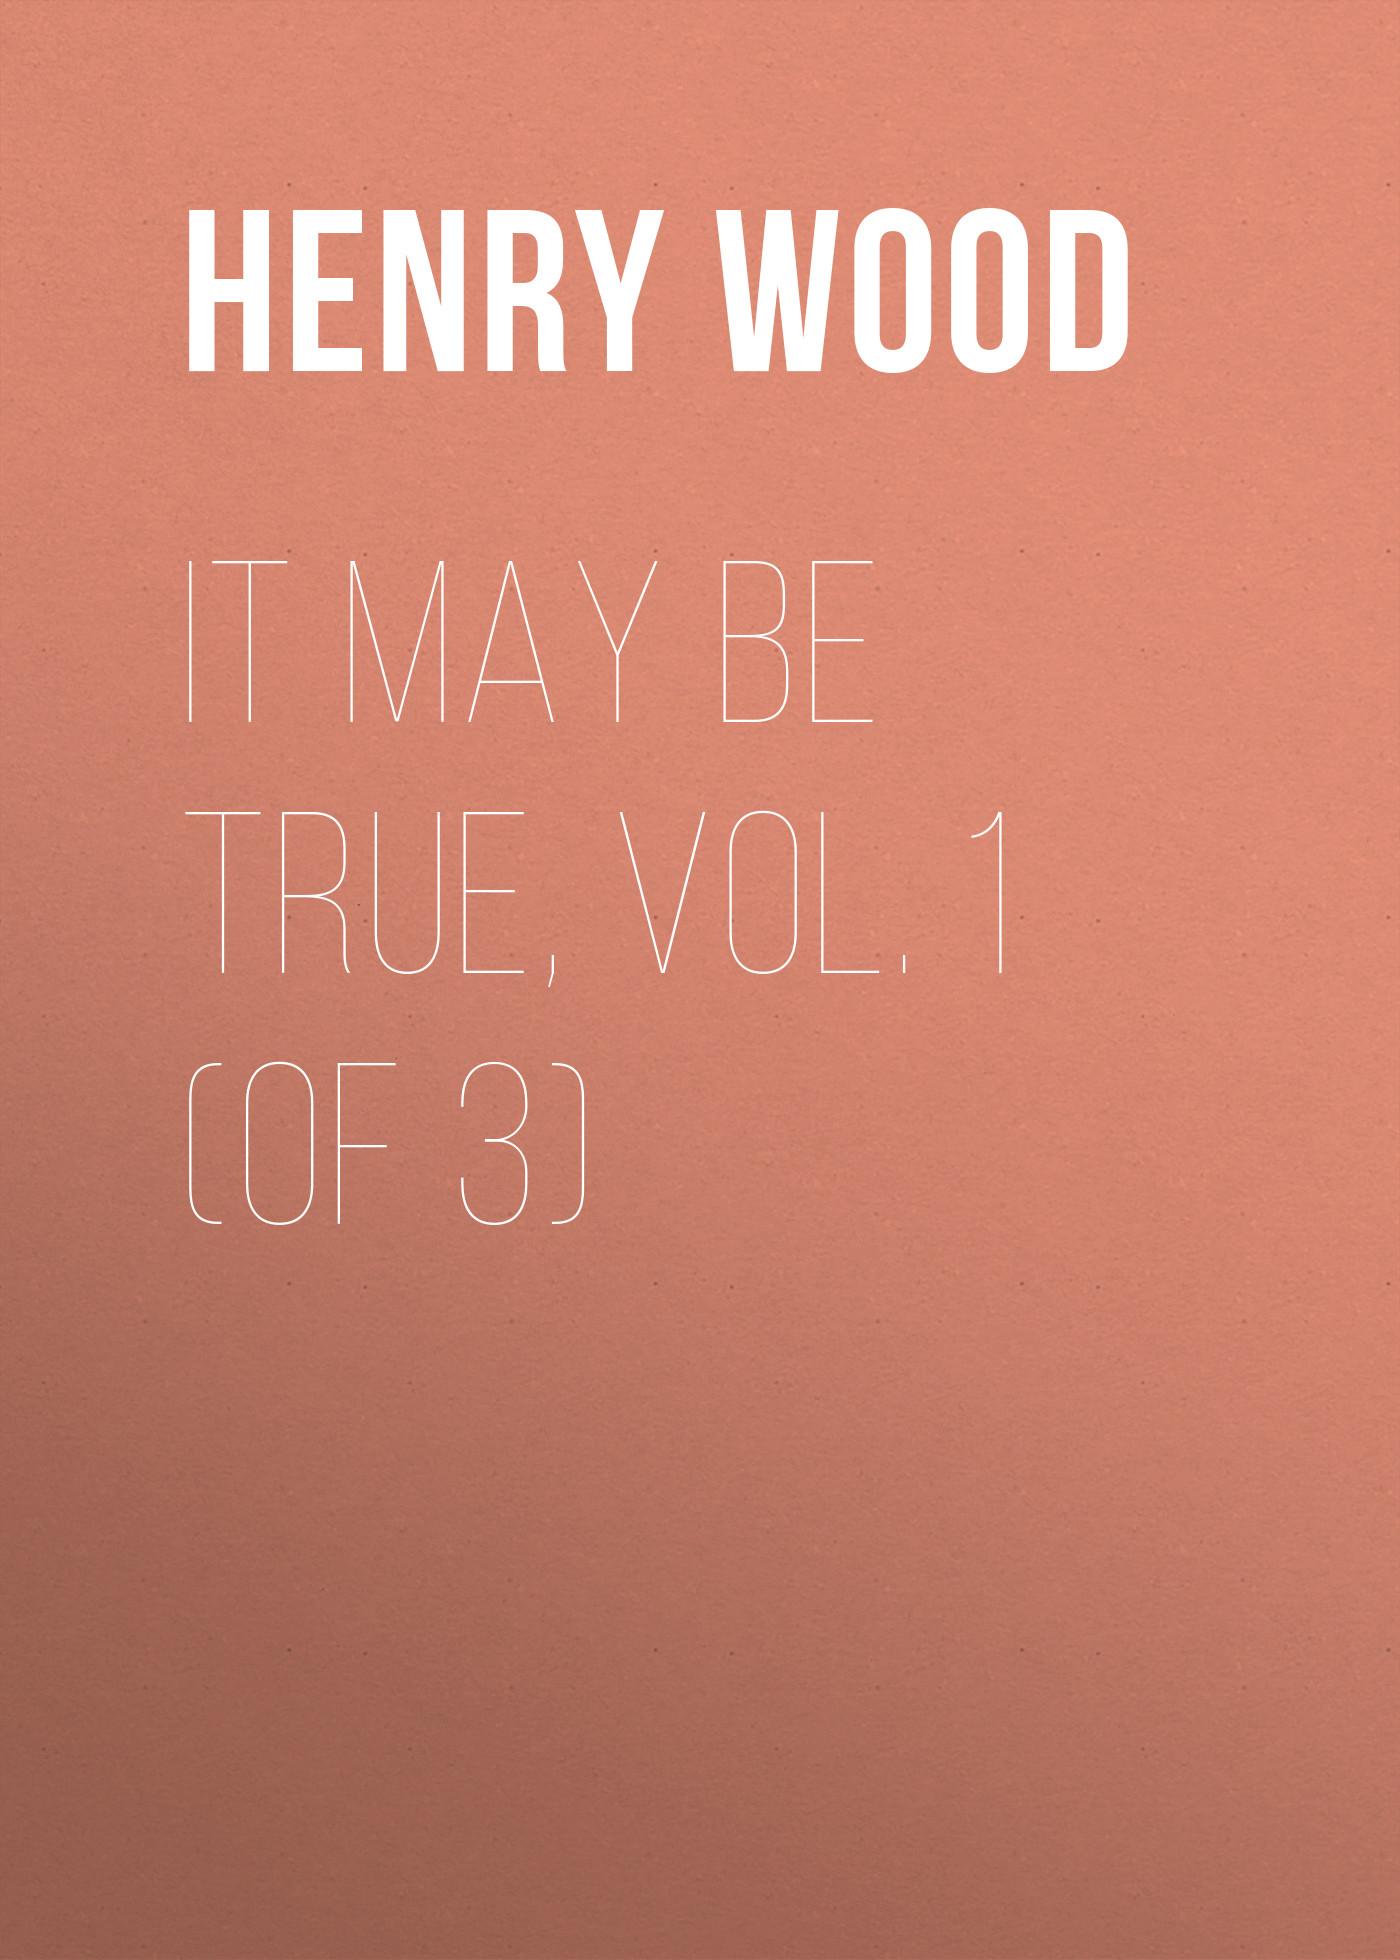 Henry Wood It May Be True, Vol. 1 (of 3) платье ruxara ruxara mp002xw0zzjk